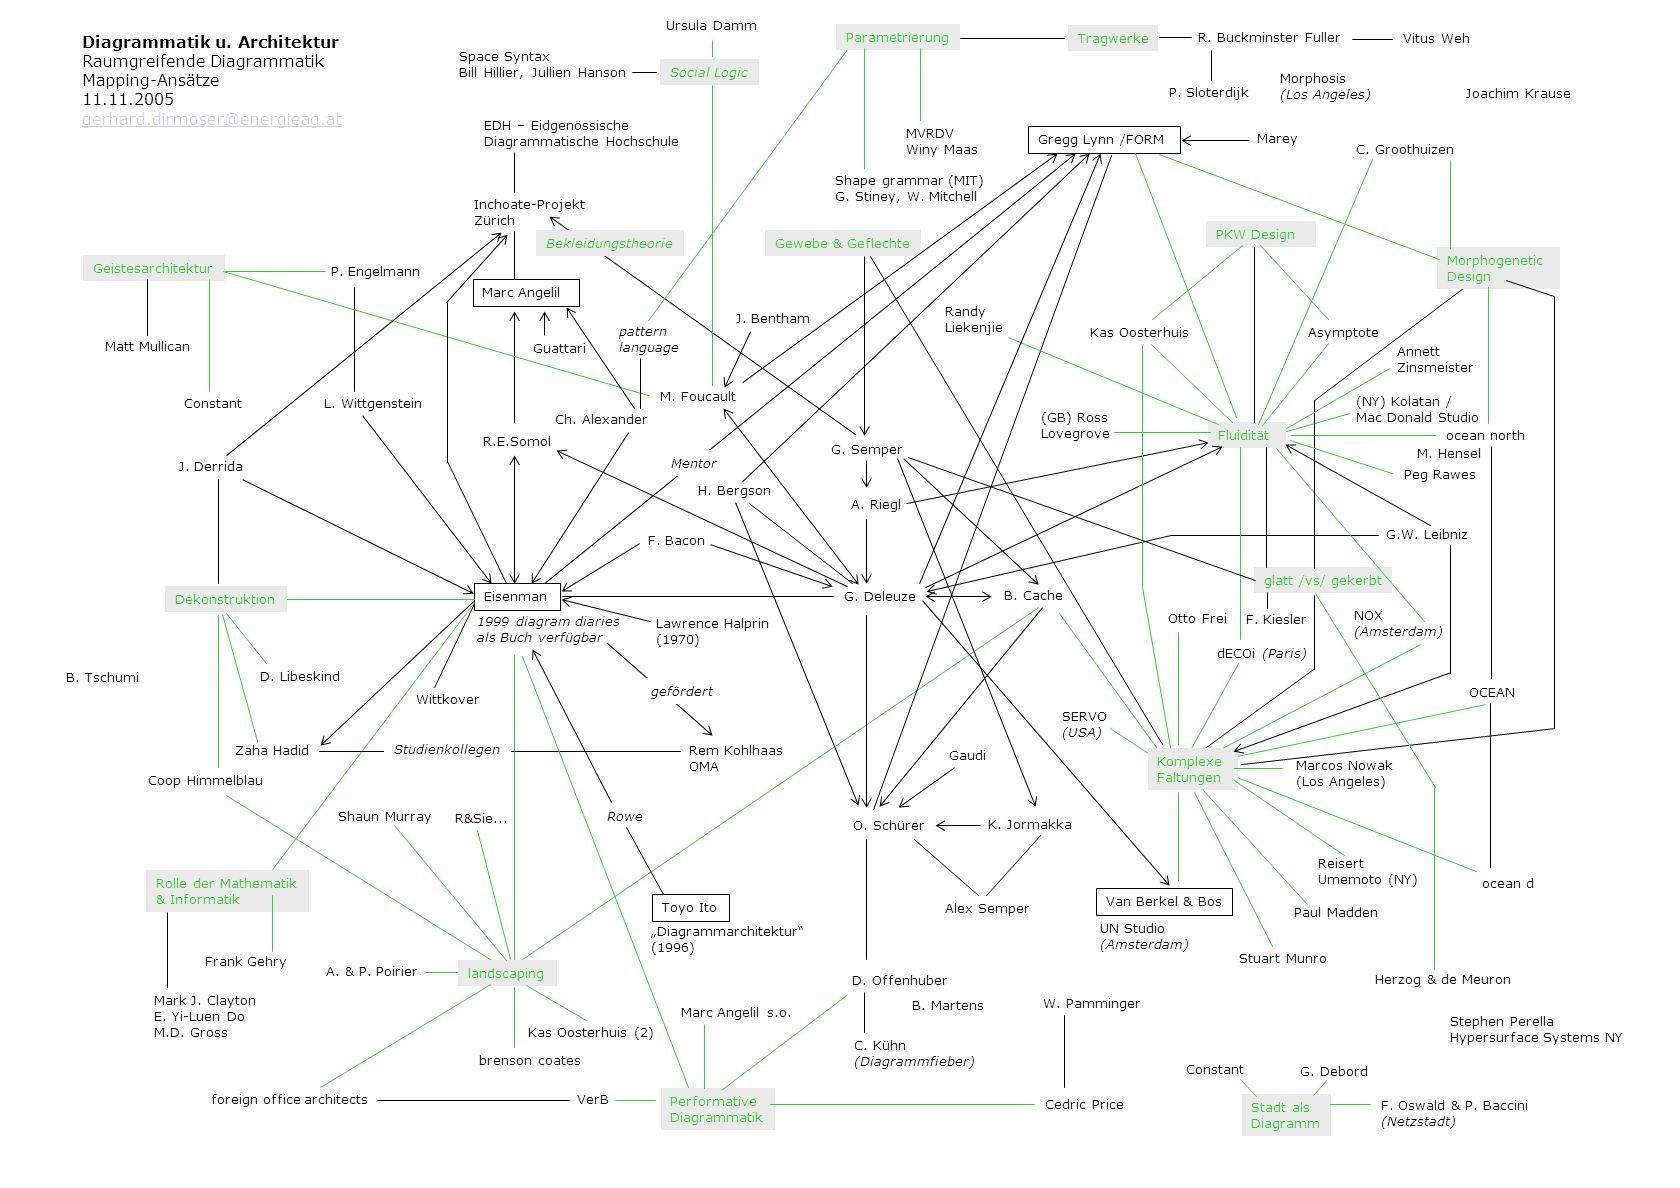 Diagrammatik u. Architektur Raumgreifende Diagrammatik Mapping-Ansätze